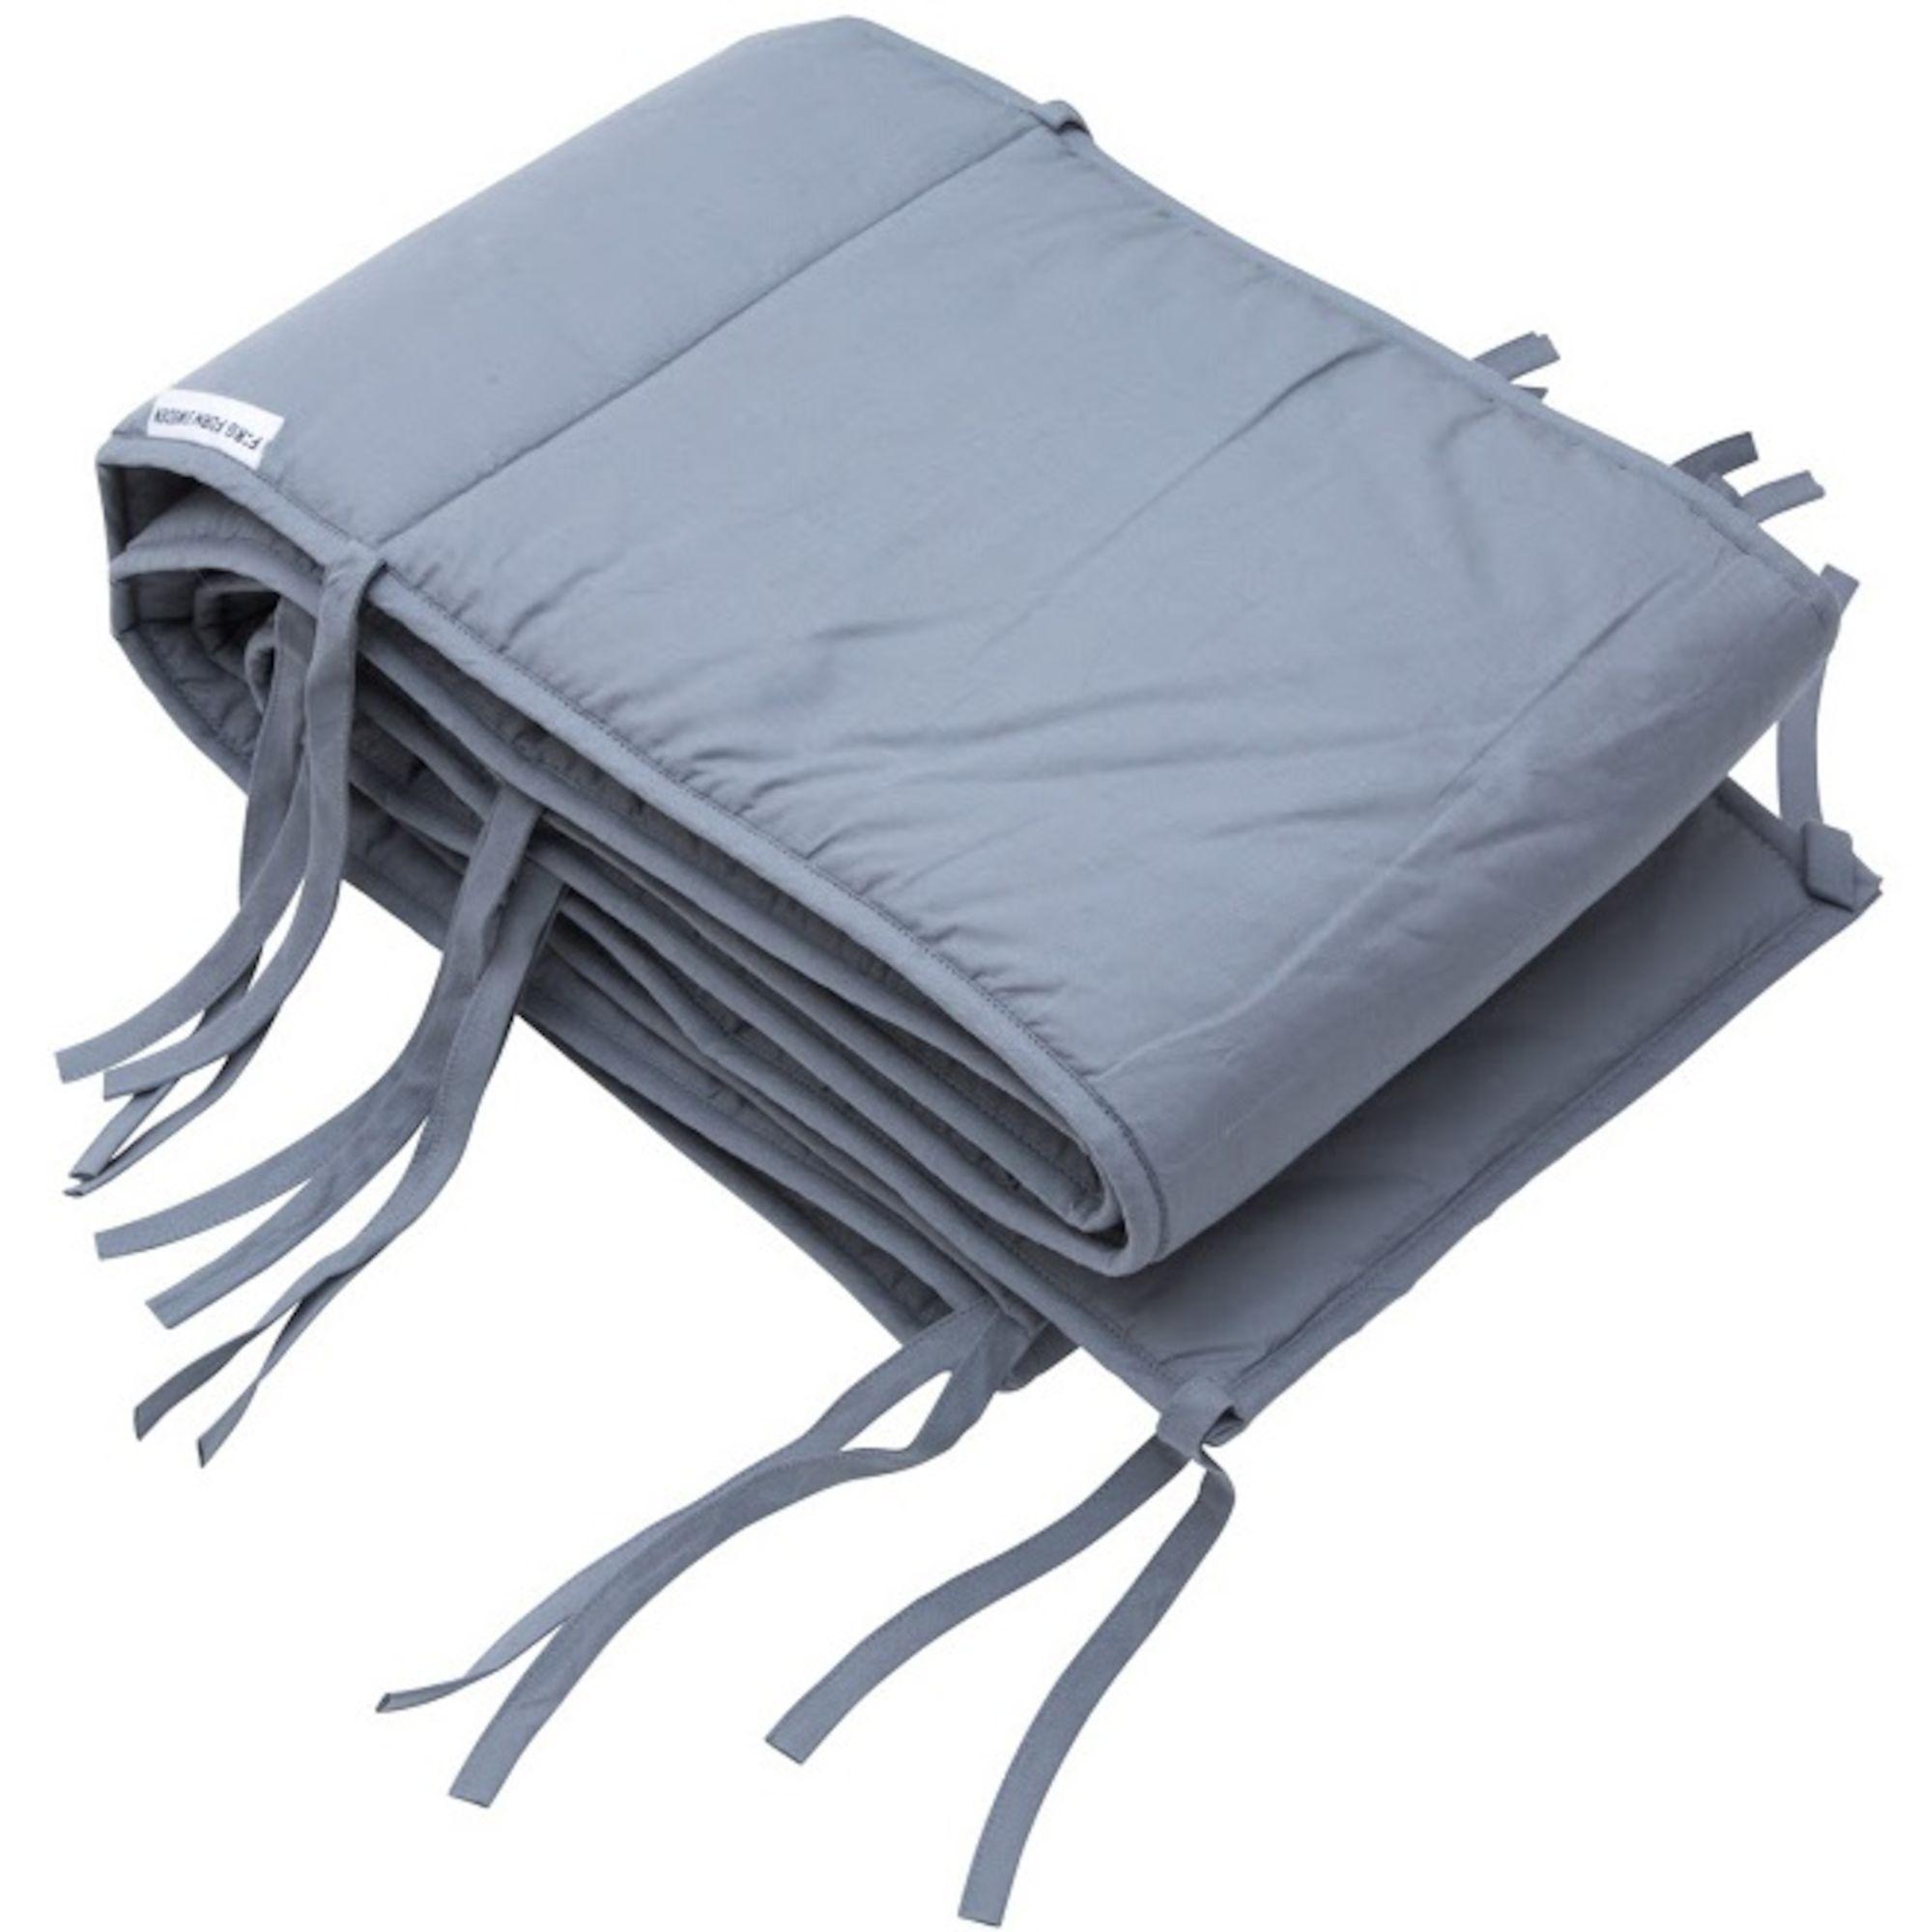 Farg Form Kinderbettschutz Kinderbett 360x28 Oko Grau Ist Ein